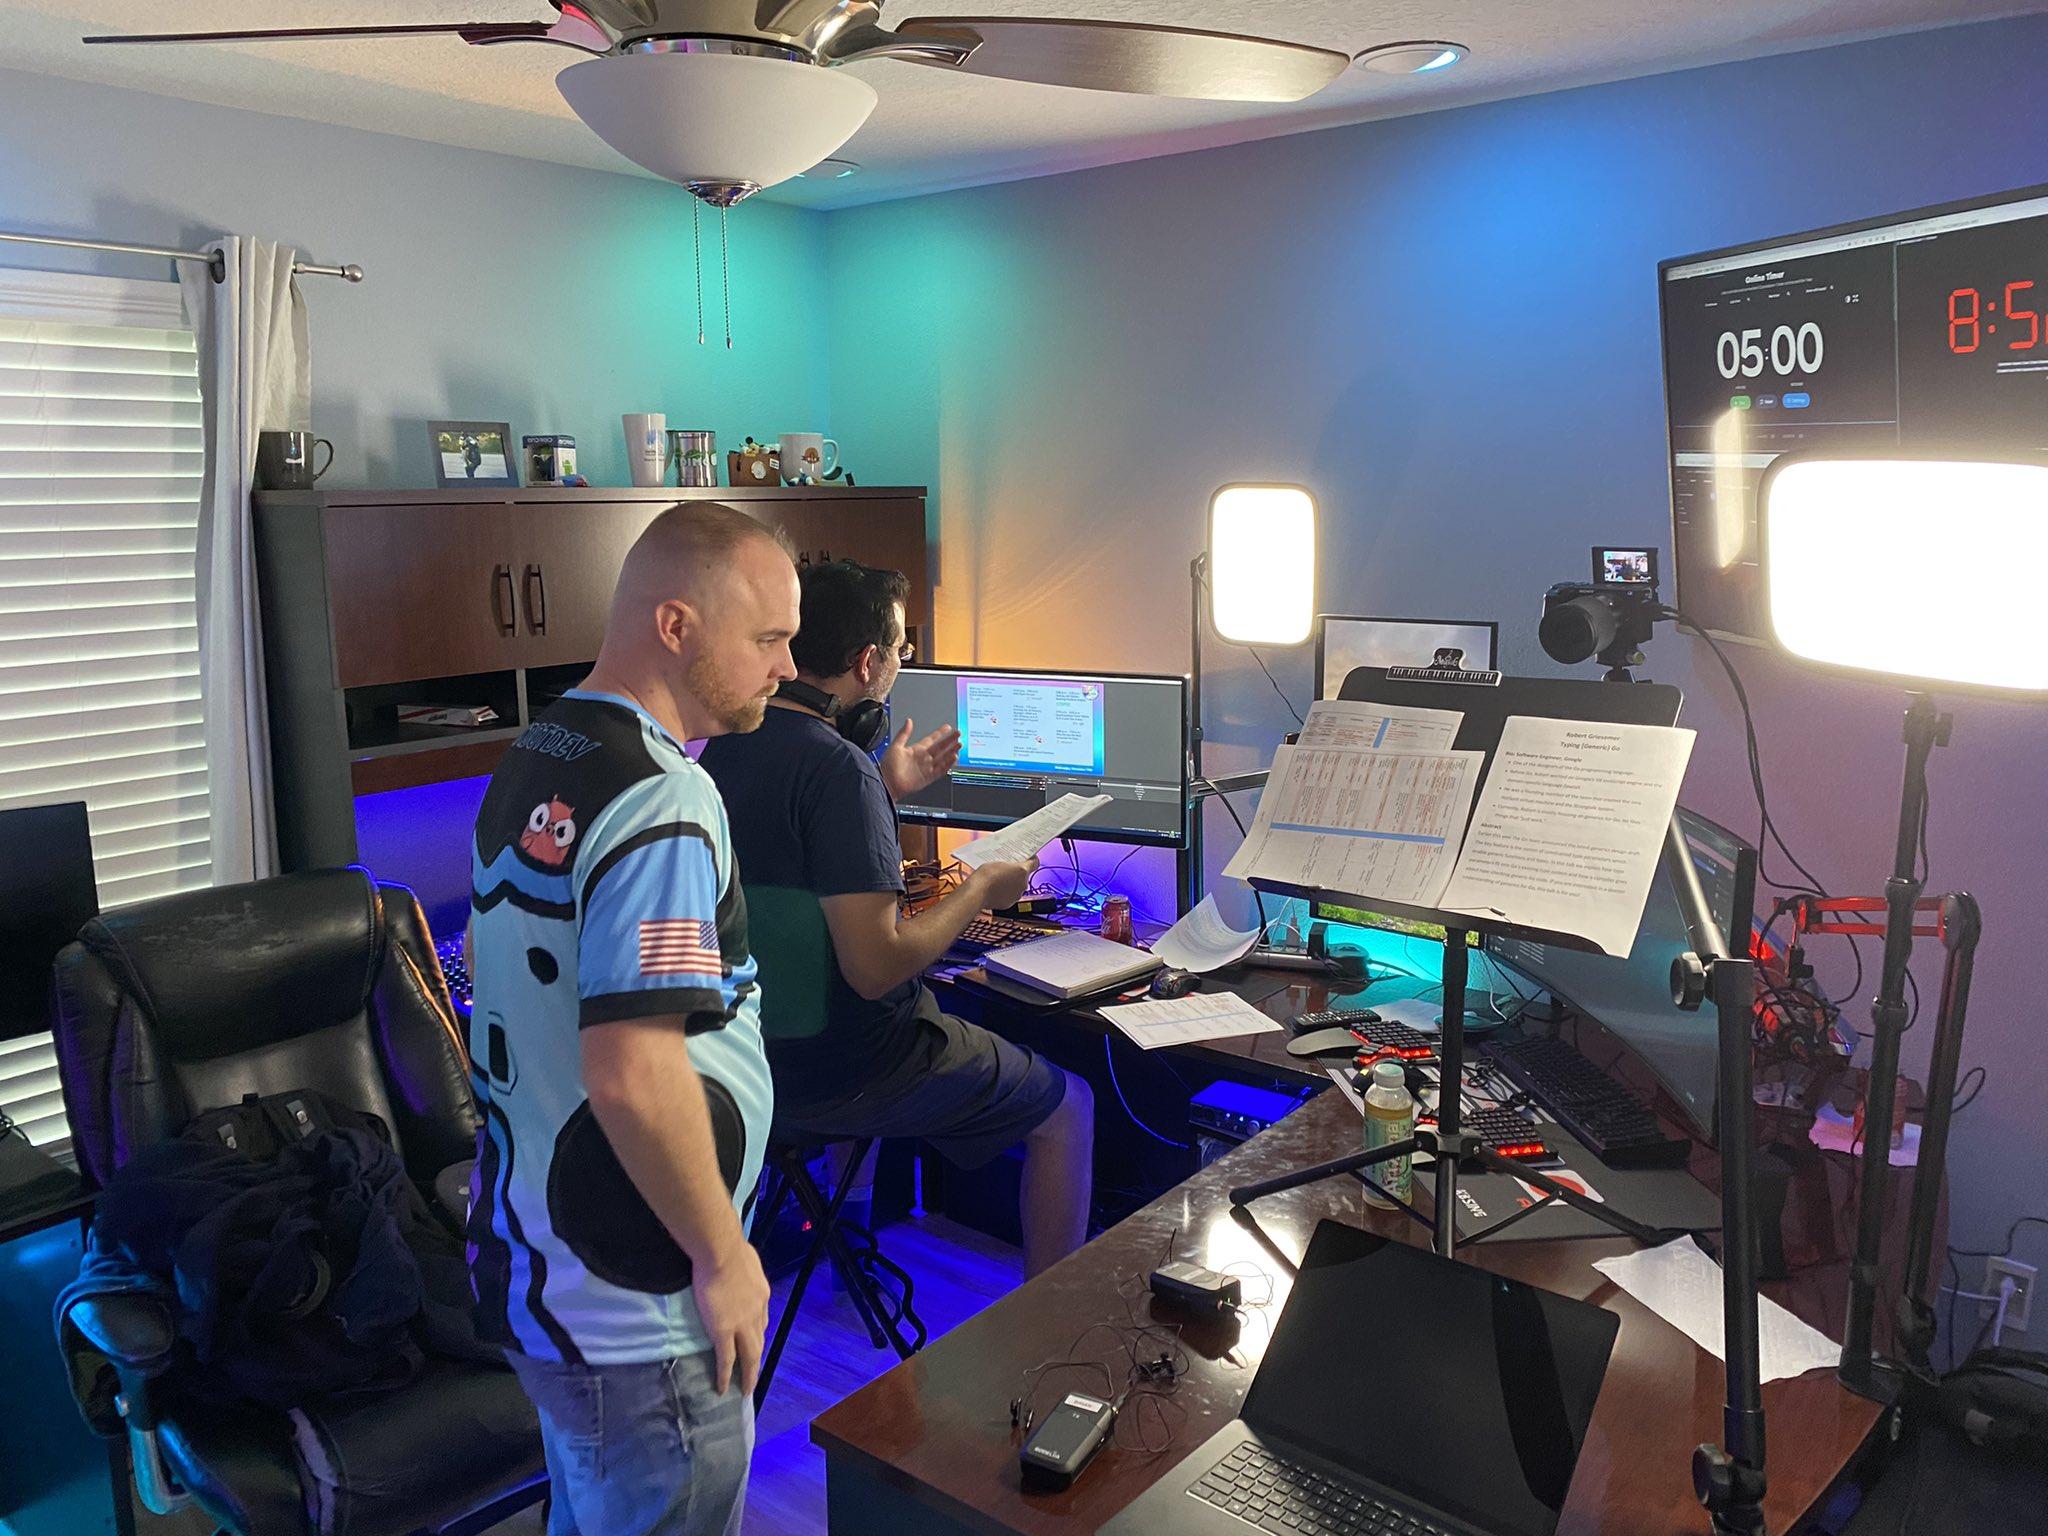 GopherCon 2020 直播指挥中心